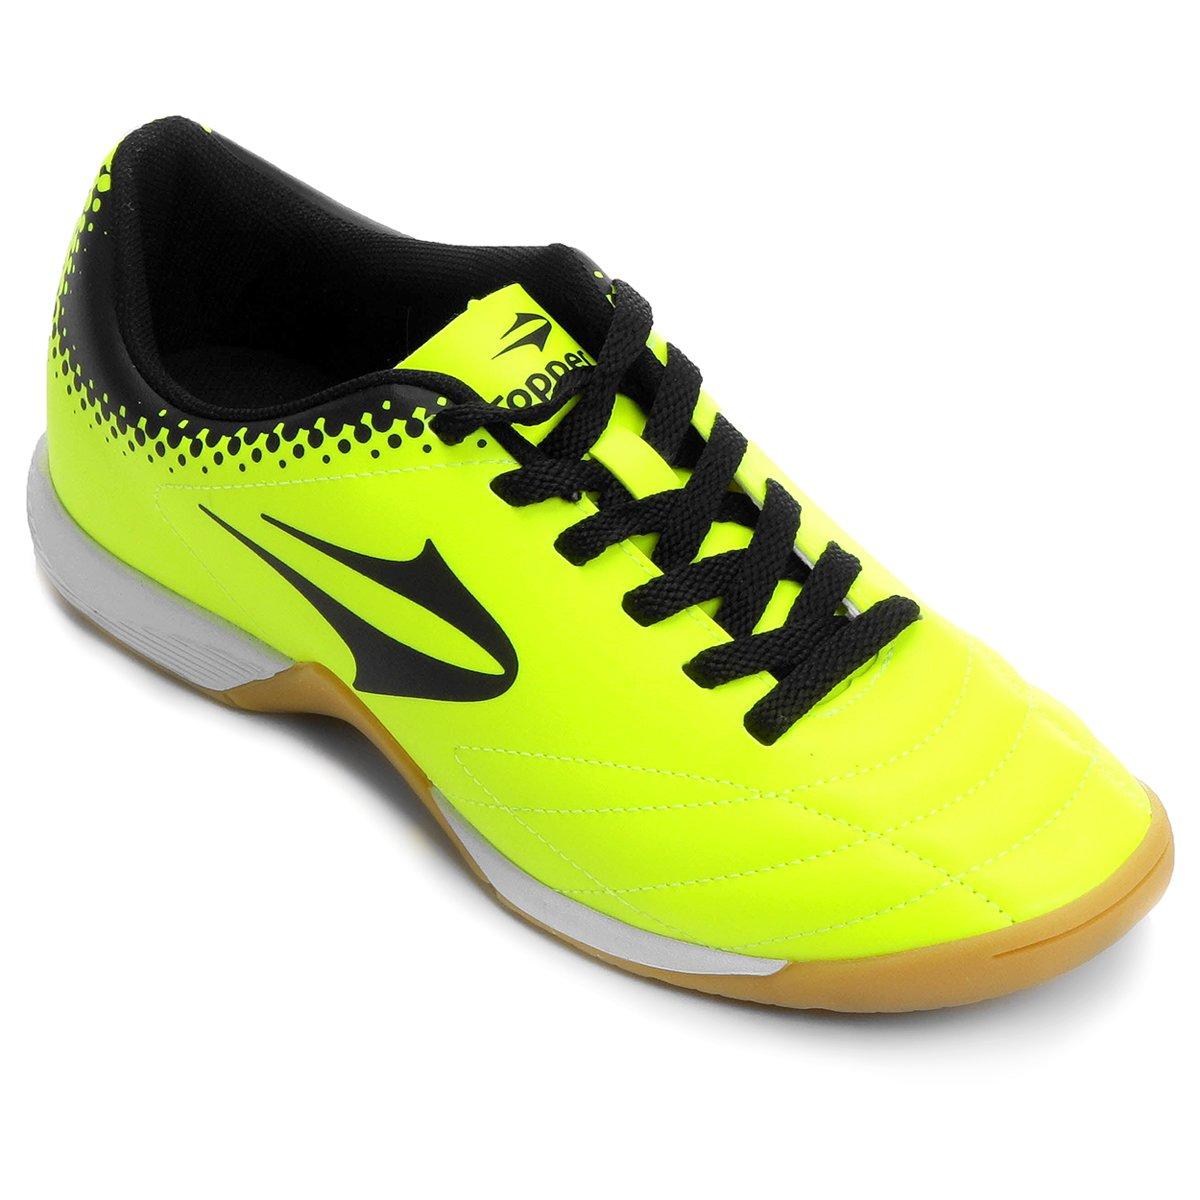 6395f912308 Chuteira Topper Sprint Futsal